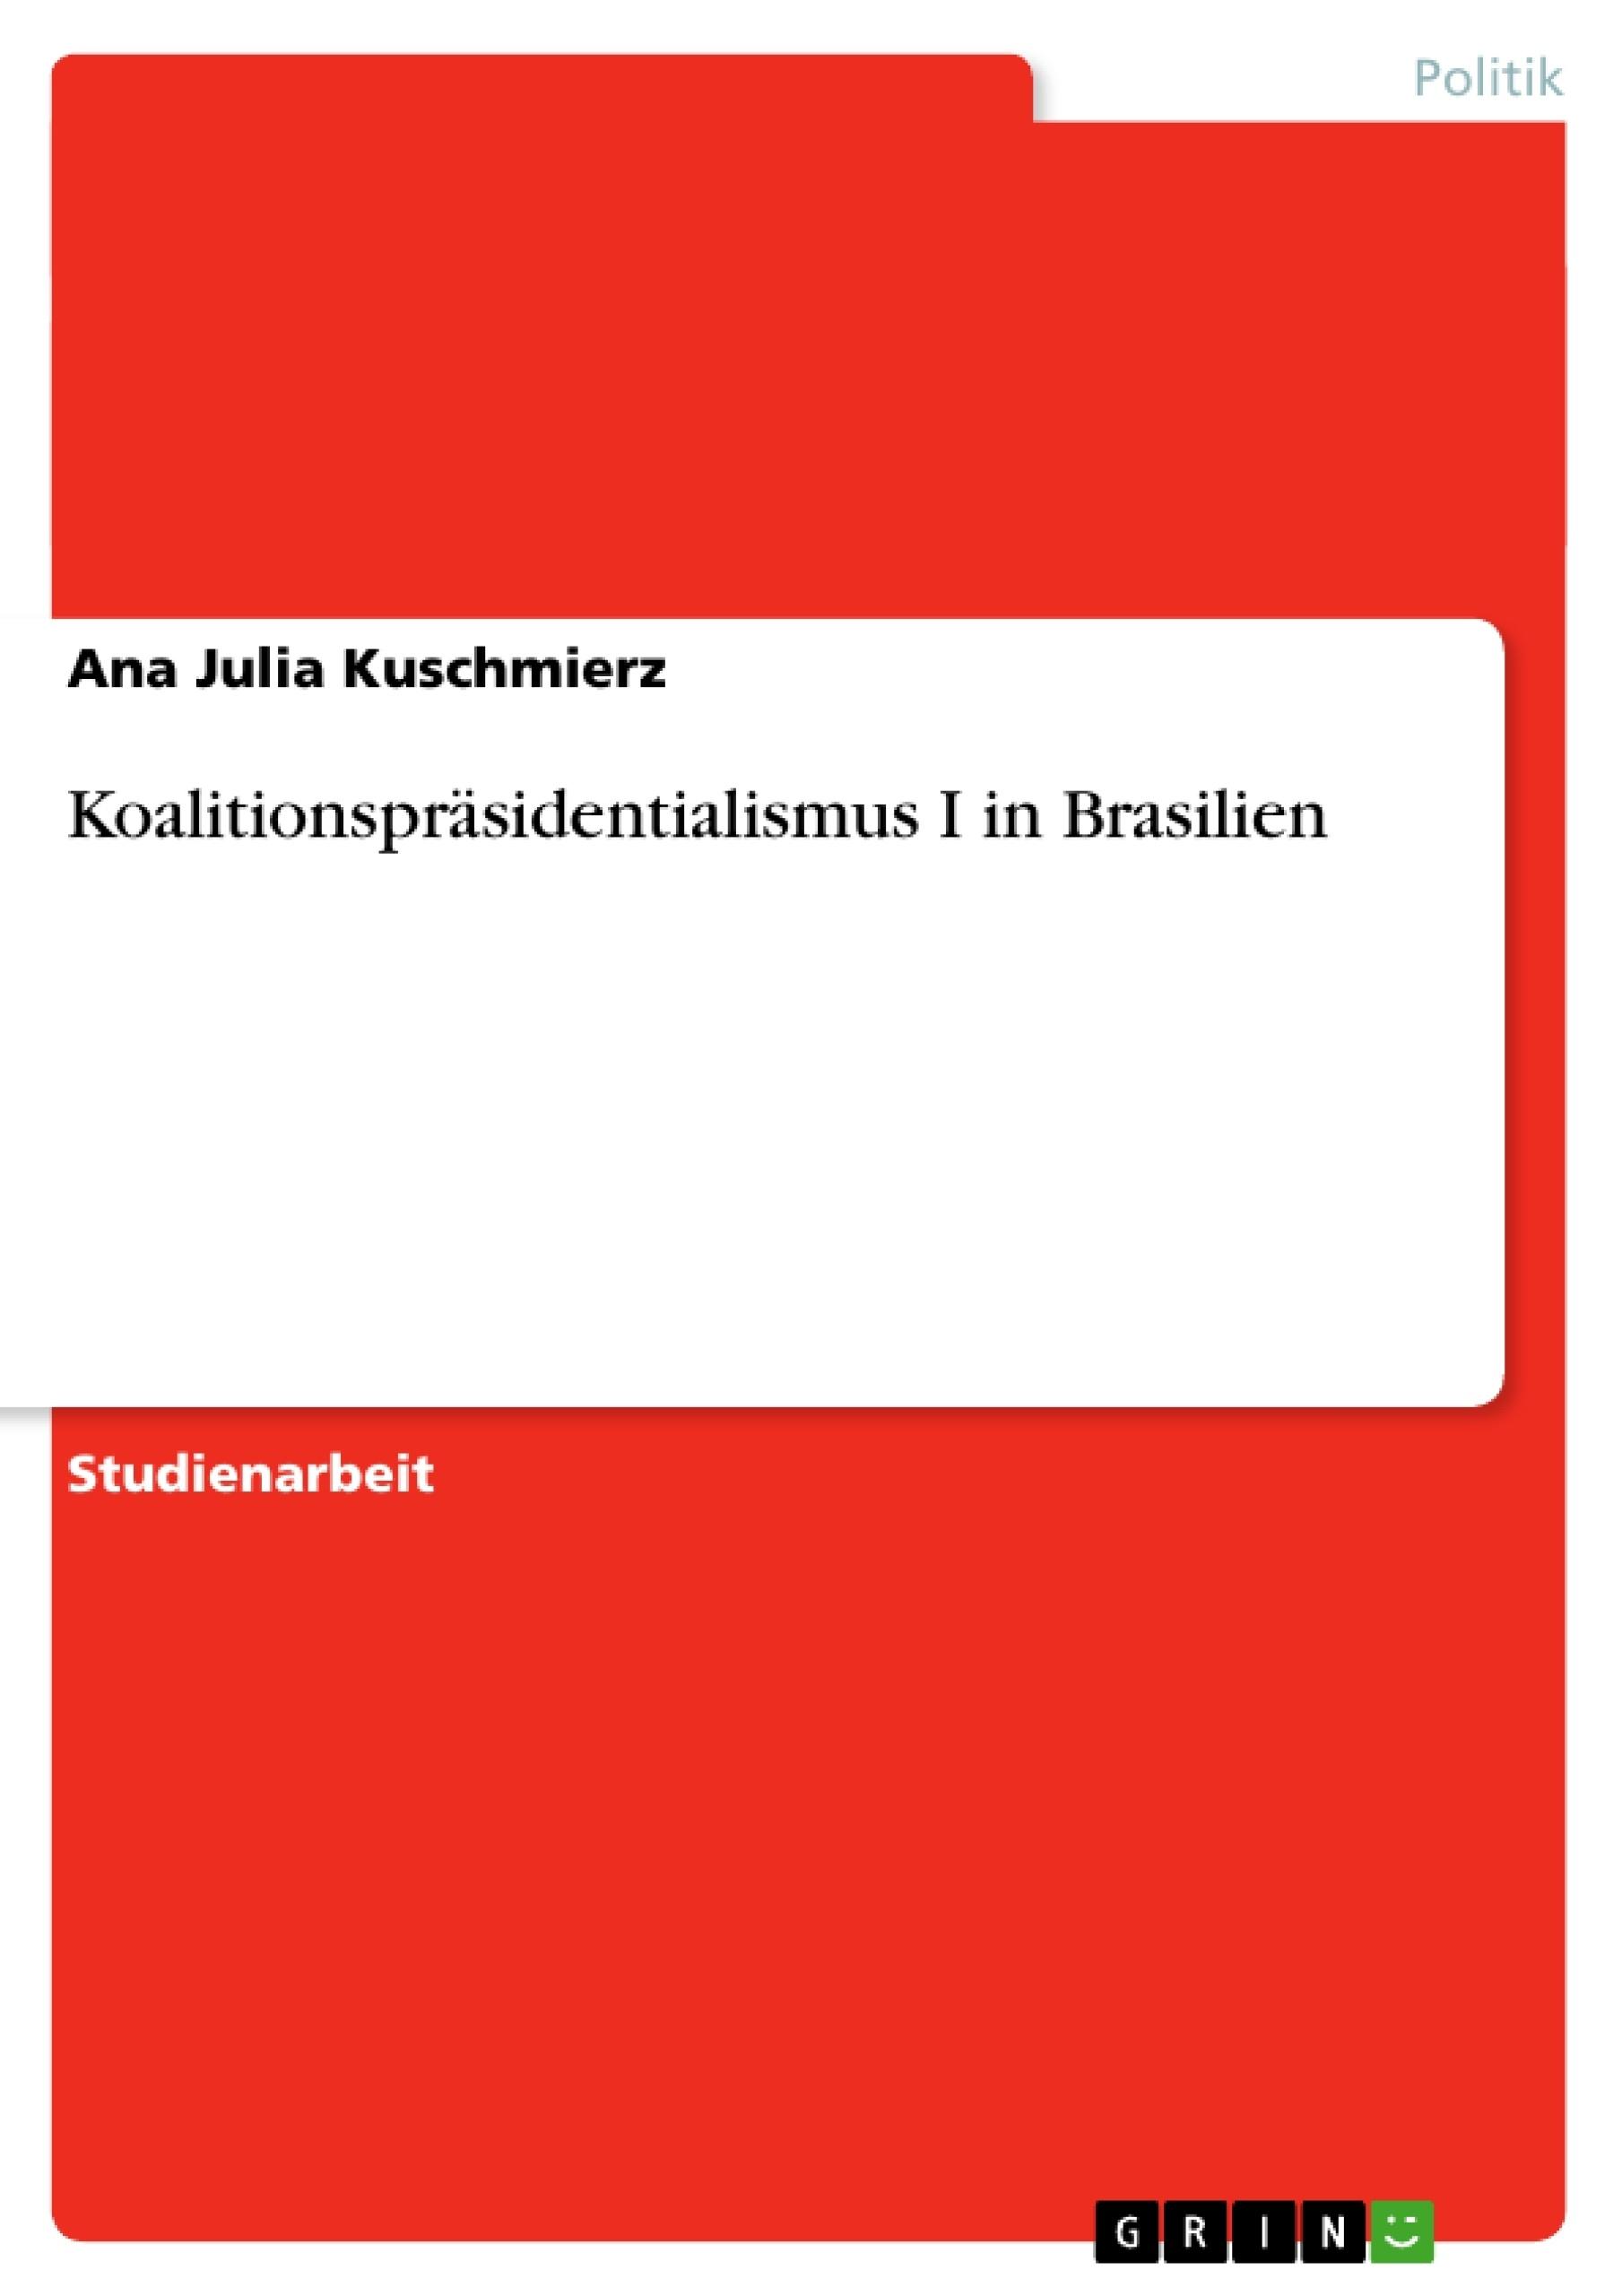 Titel: Koalitionspräsidentialismus I in Brasilien